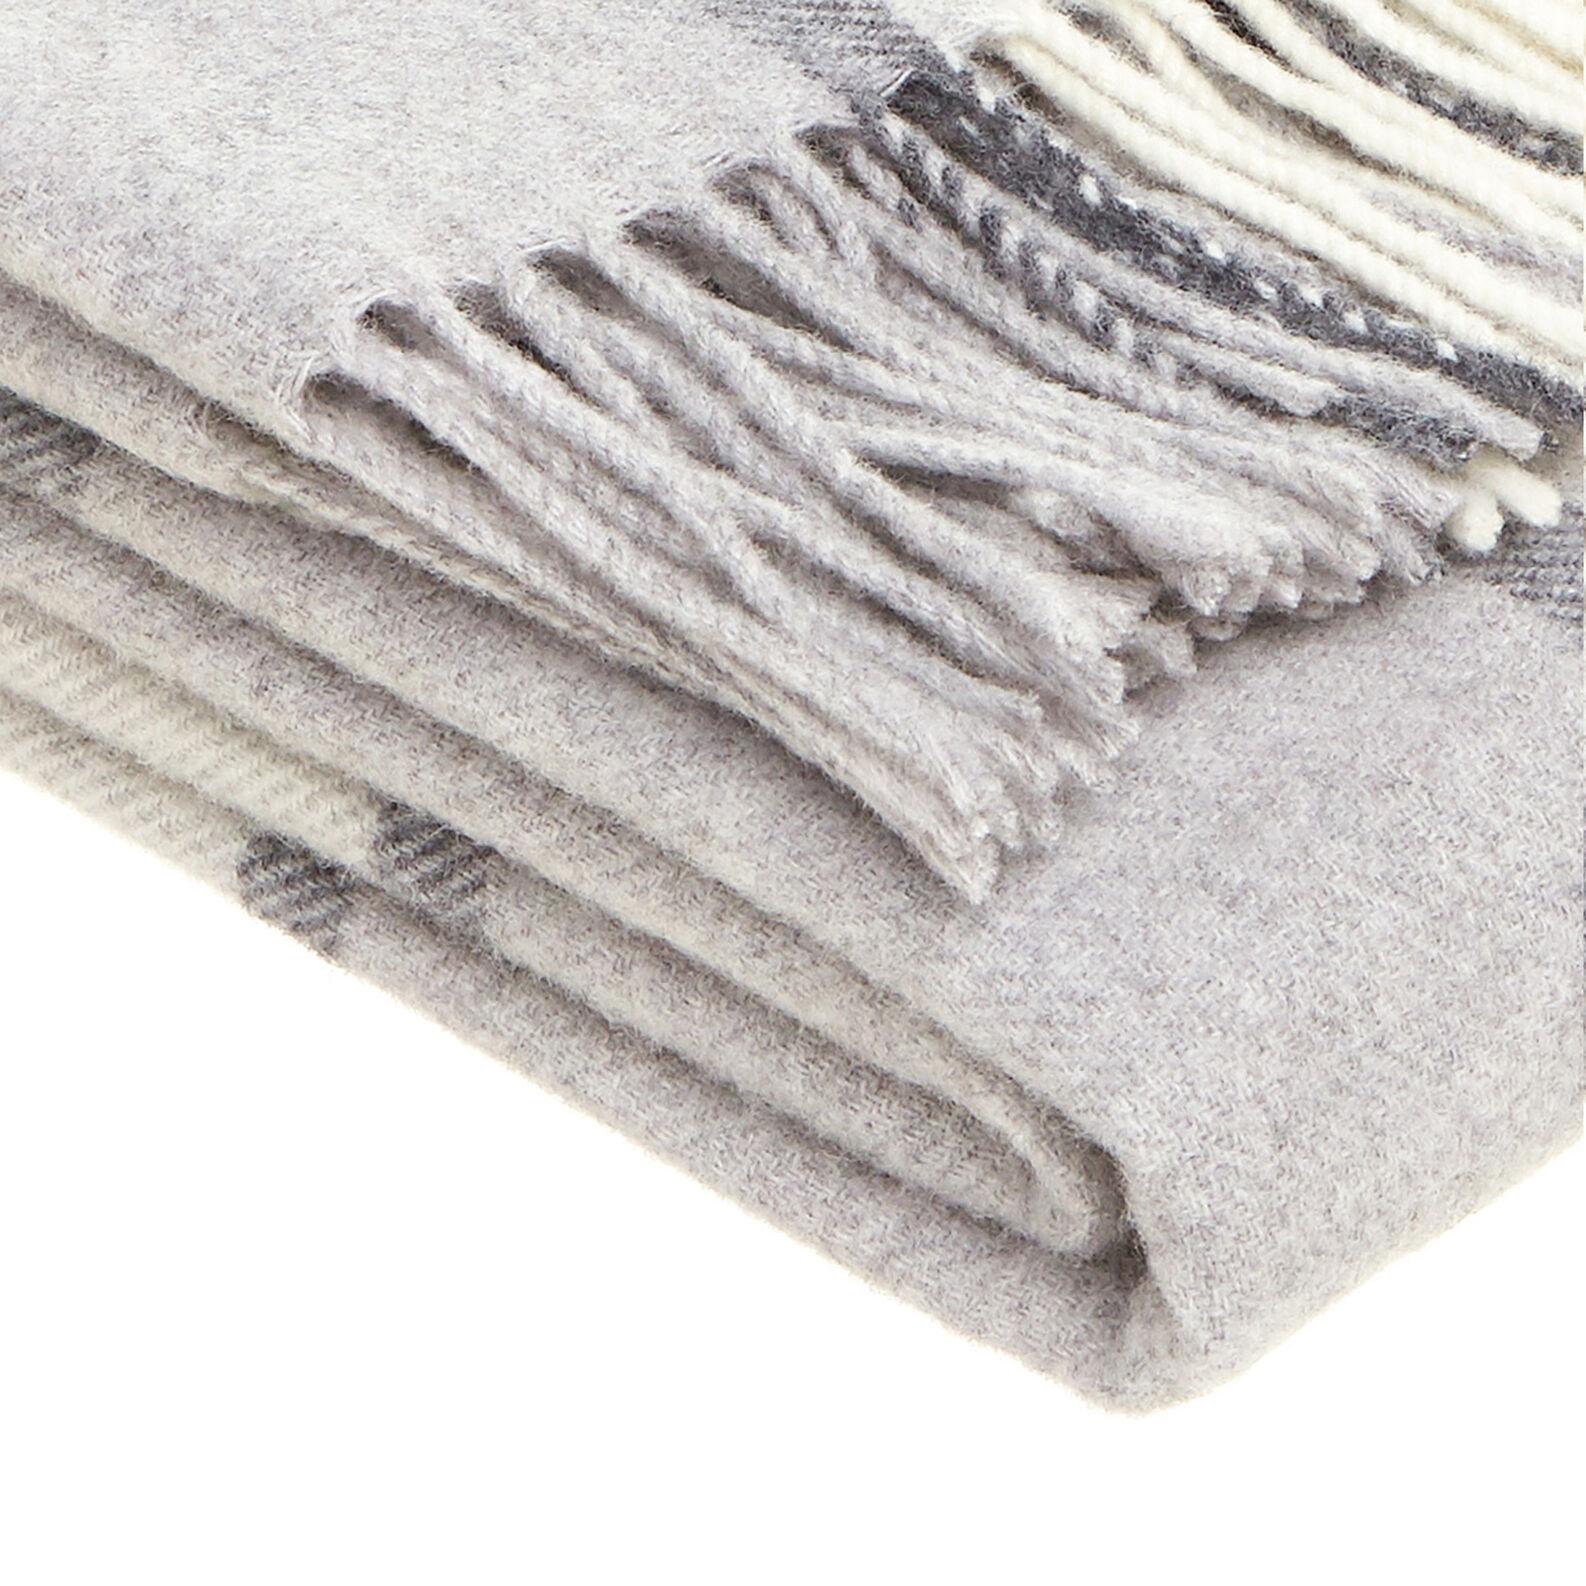 Portofino checked throw in 100% wool